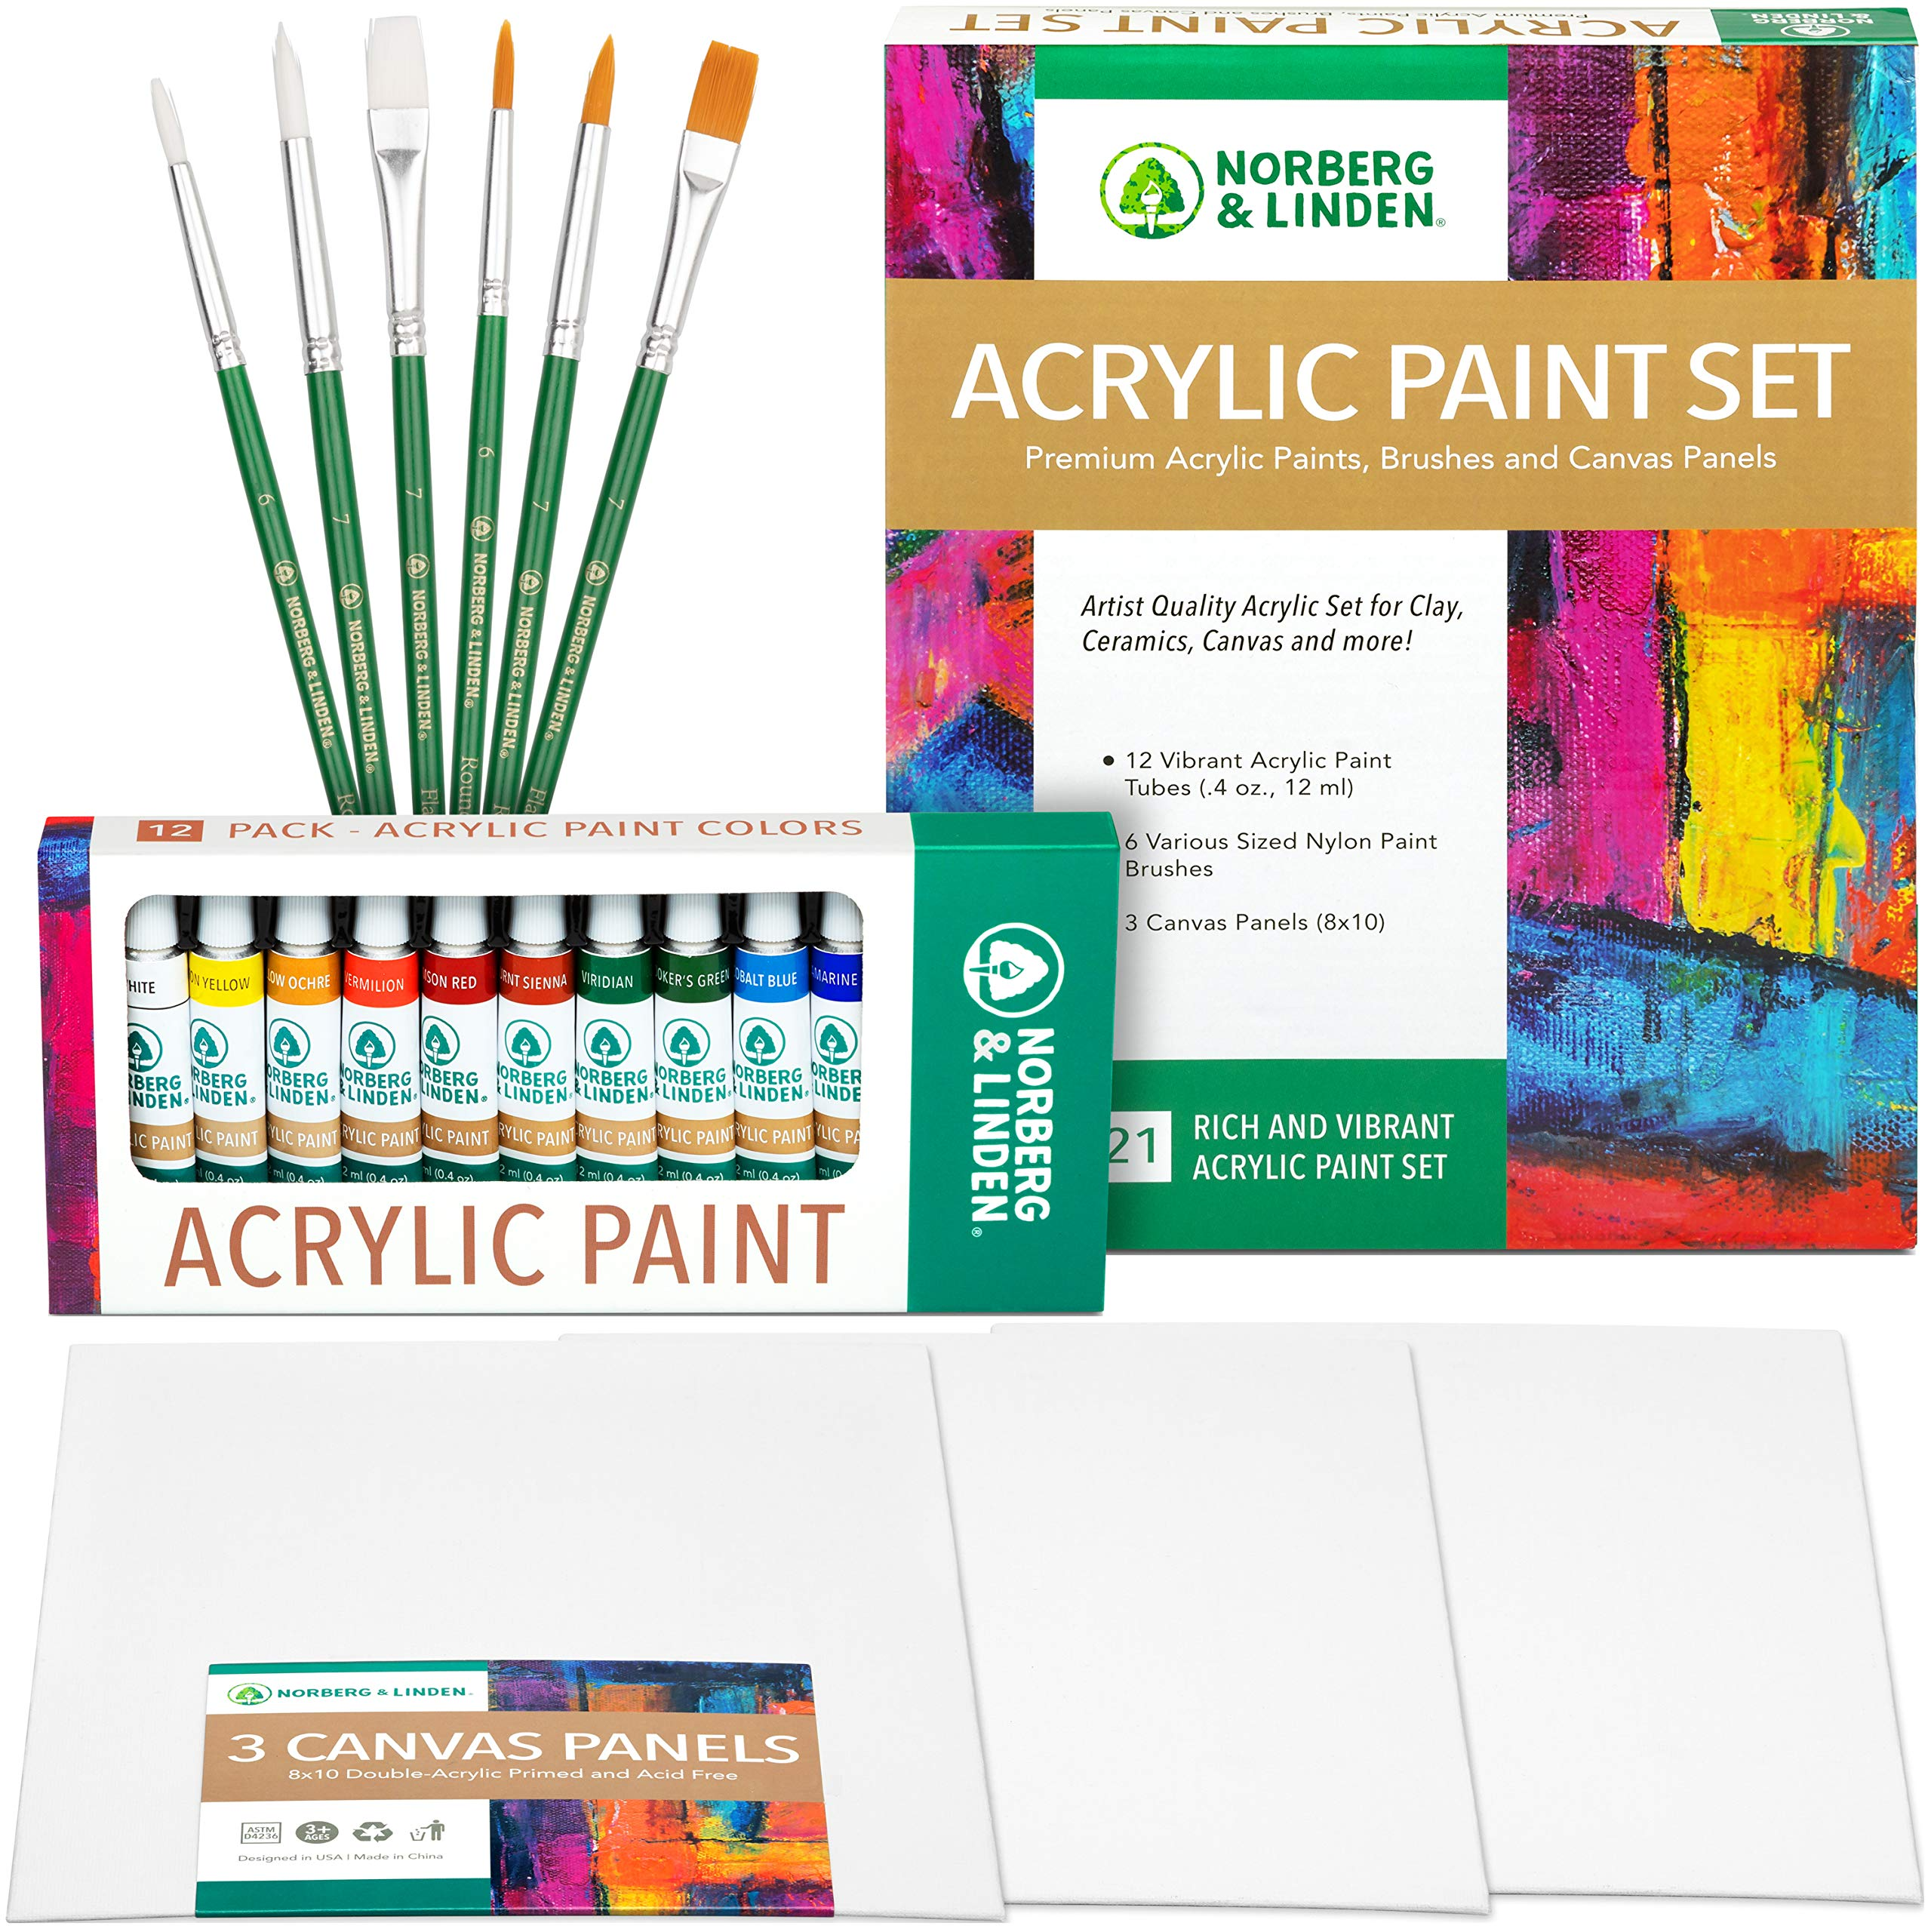 Acrylic Art Set - 12 Acrylic Paint Tubes - 6 Paint Brushes - 3 Canvas Panels - Art Supplies